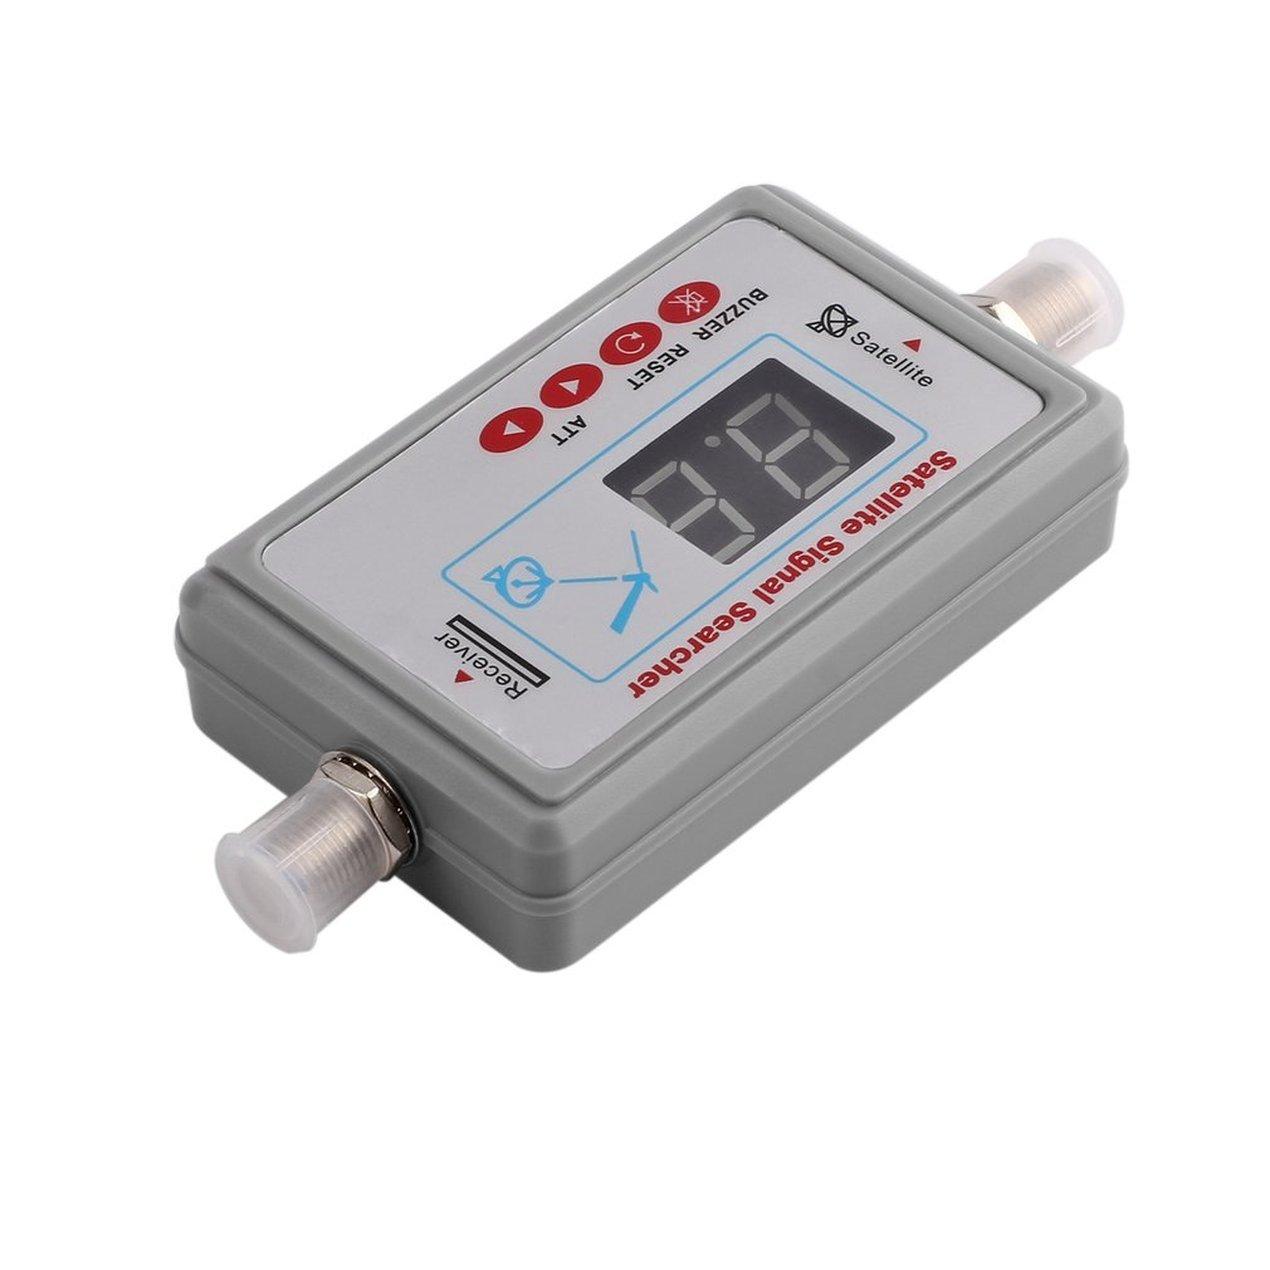 Satellite Signal Finder, TV Satellite Receiver Meter, Mini Portable Digital Antenna, LCD Buzzer JS-SF05 TV Signal Detector Tool Dooret